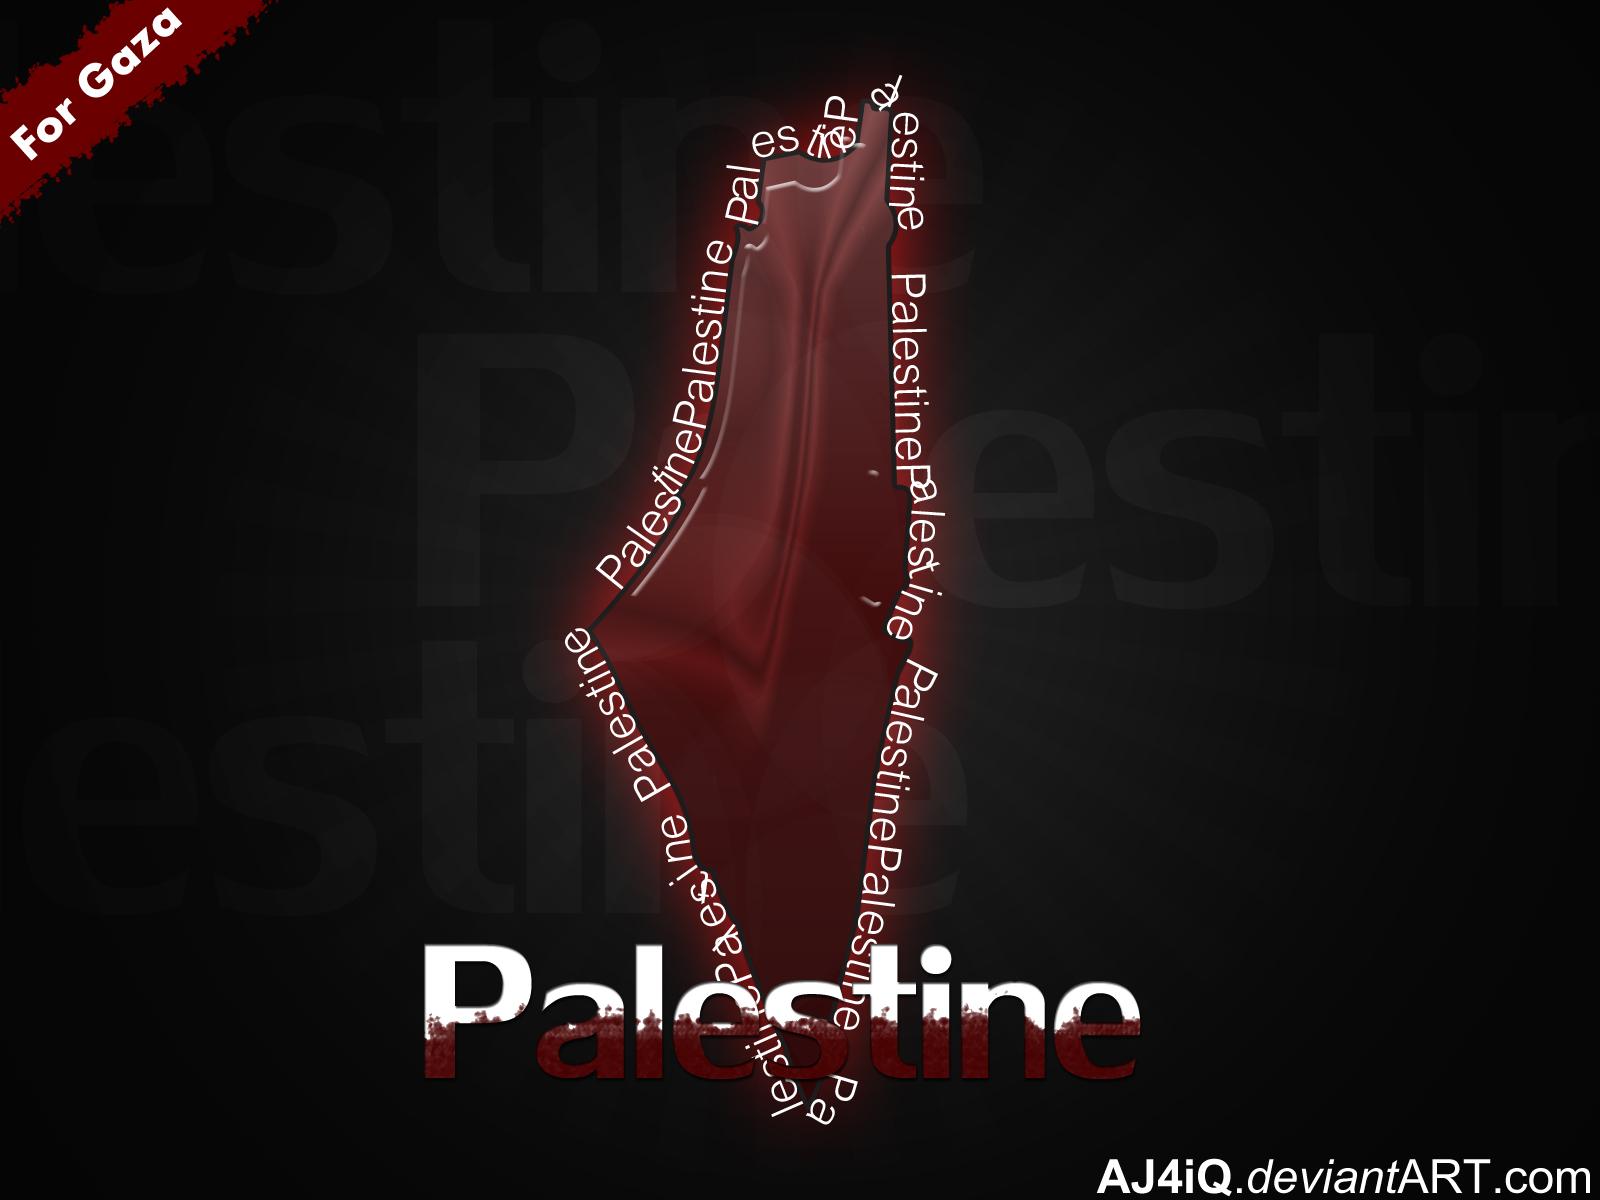 http://3.bp.blogspot.com/-aNv_sdVAV9M/TY7LYOt2vaI/AAAAAAAAAlM/_VNKV_uoJKU/s1600/Palestine-Wallpaper.jpg